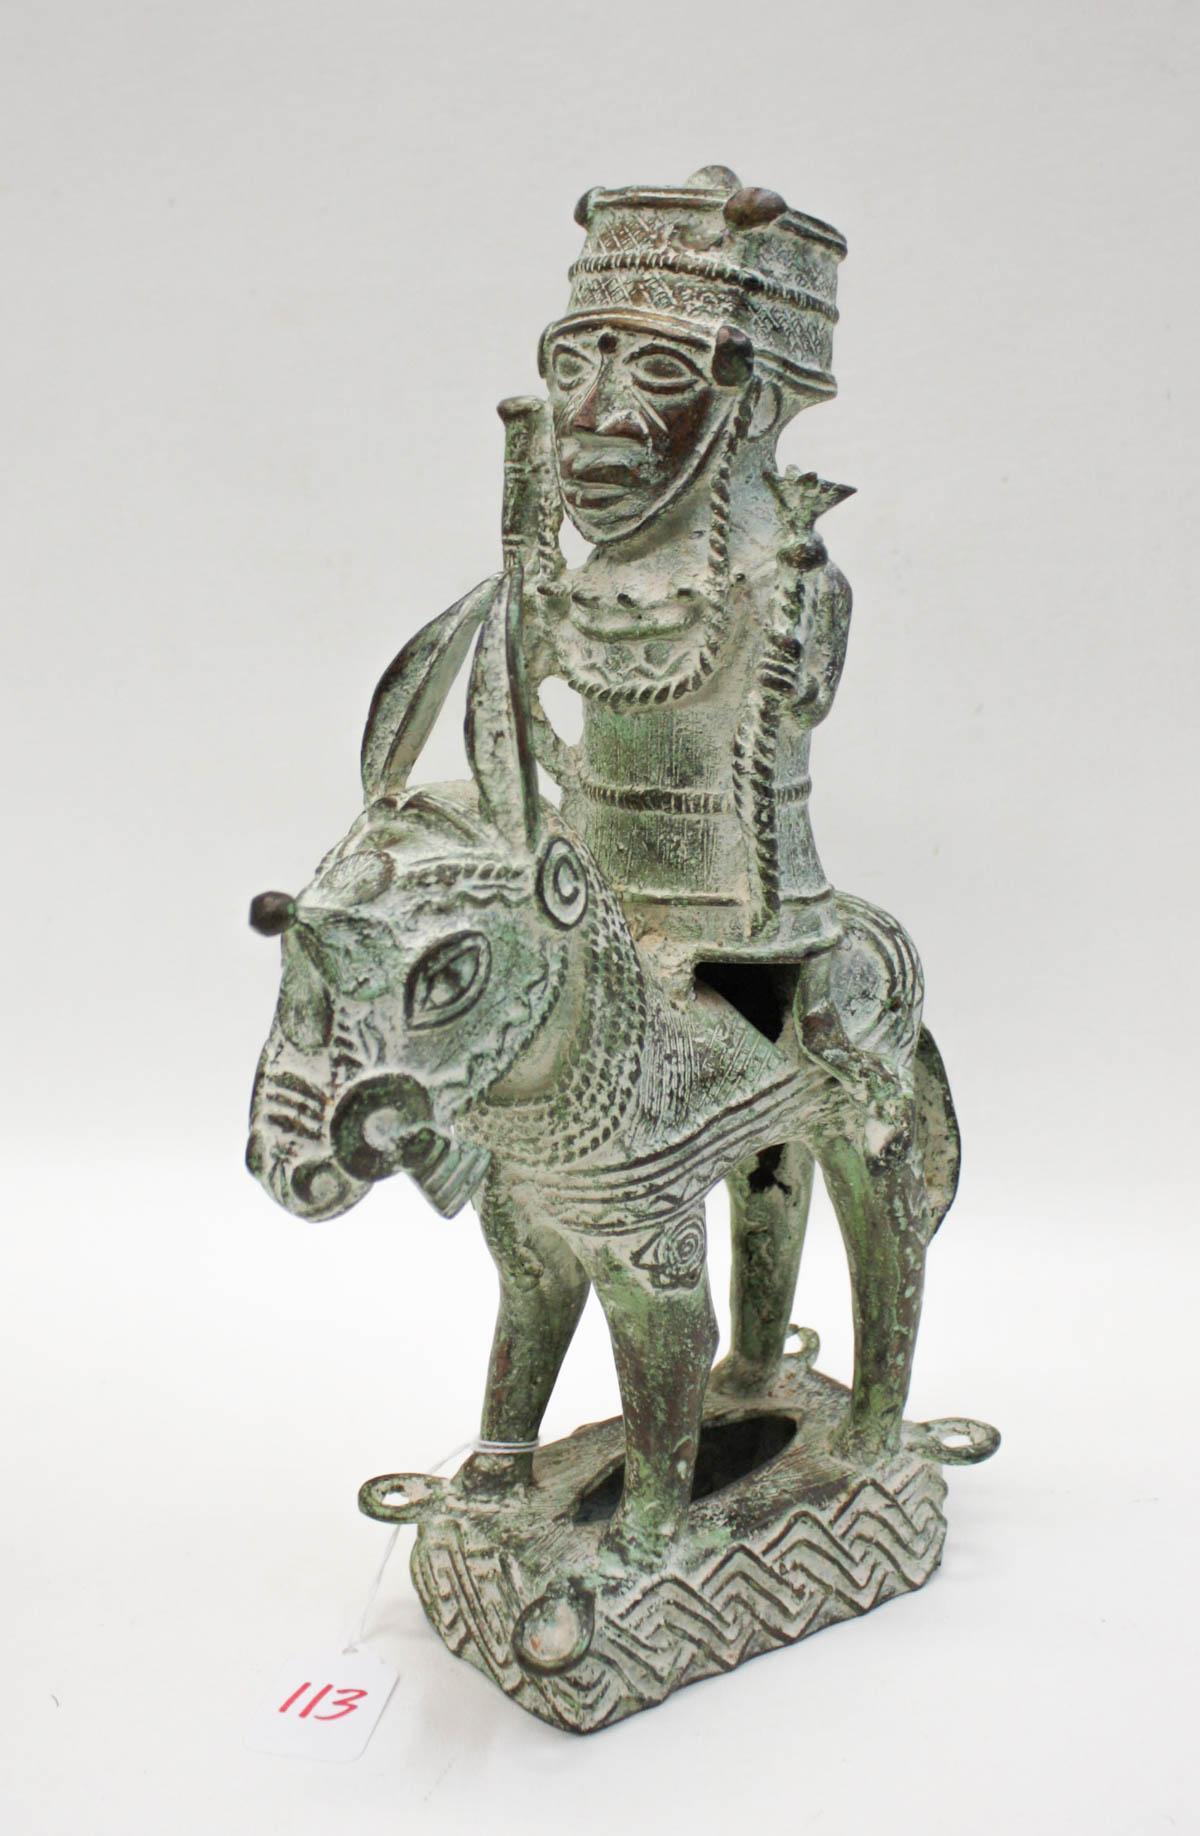 AFRICAN PATINATED BRONZE HORSE & RIDER SCULPTURE